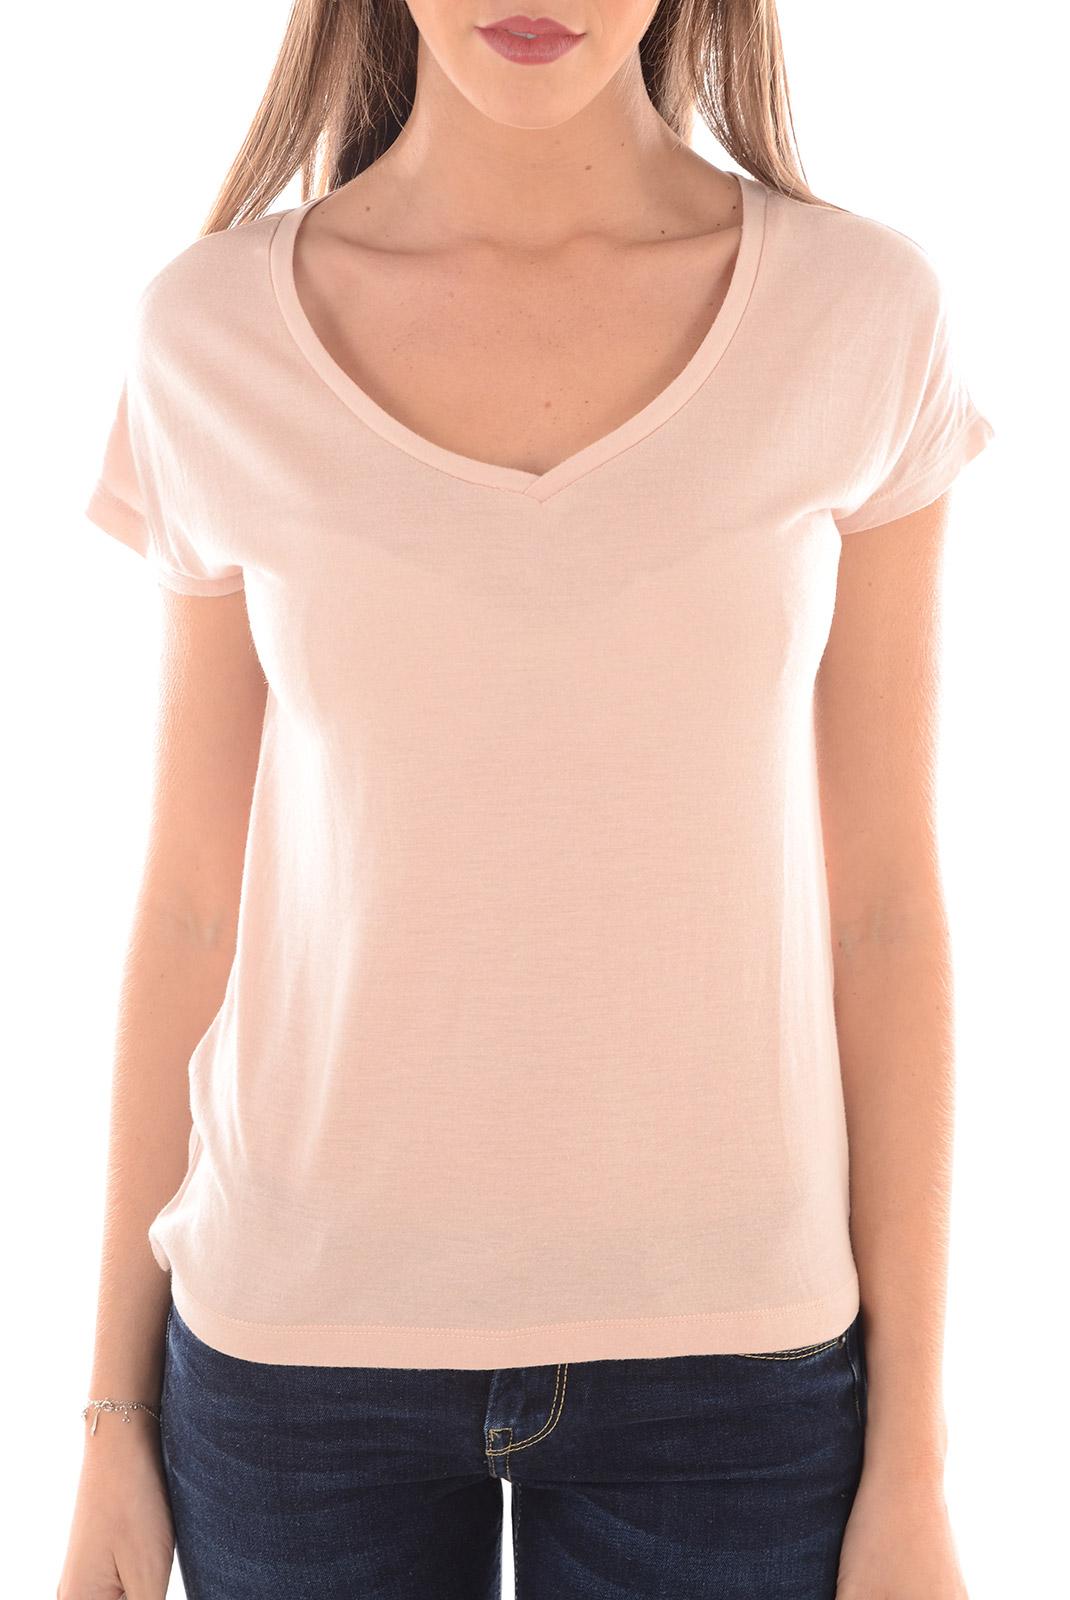 tee shirt femme vero moda nancy ss top dnm rose dust w silver. Black Bedroom Furniture Sets. Home Design Ideas